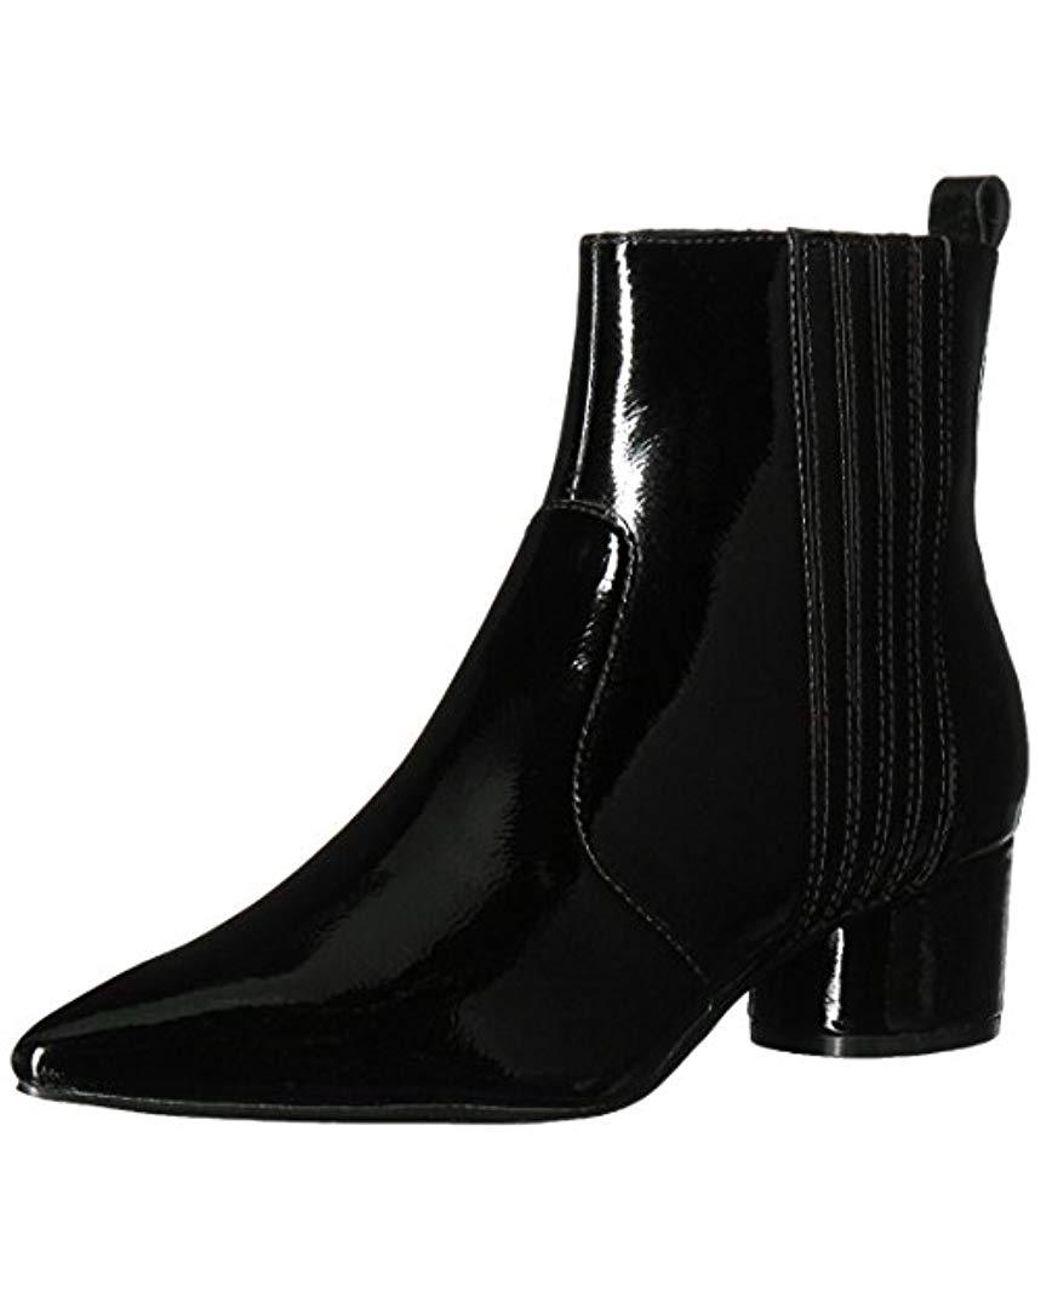 c019c4c9465 Women's Black Laila Fashion Boot